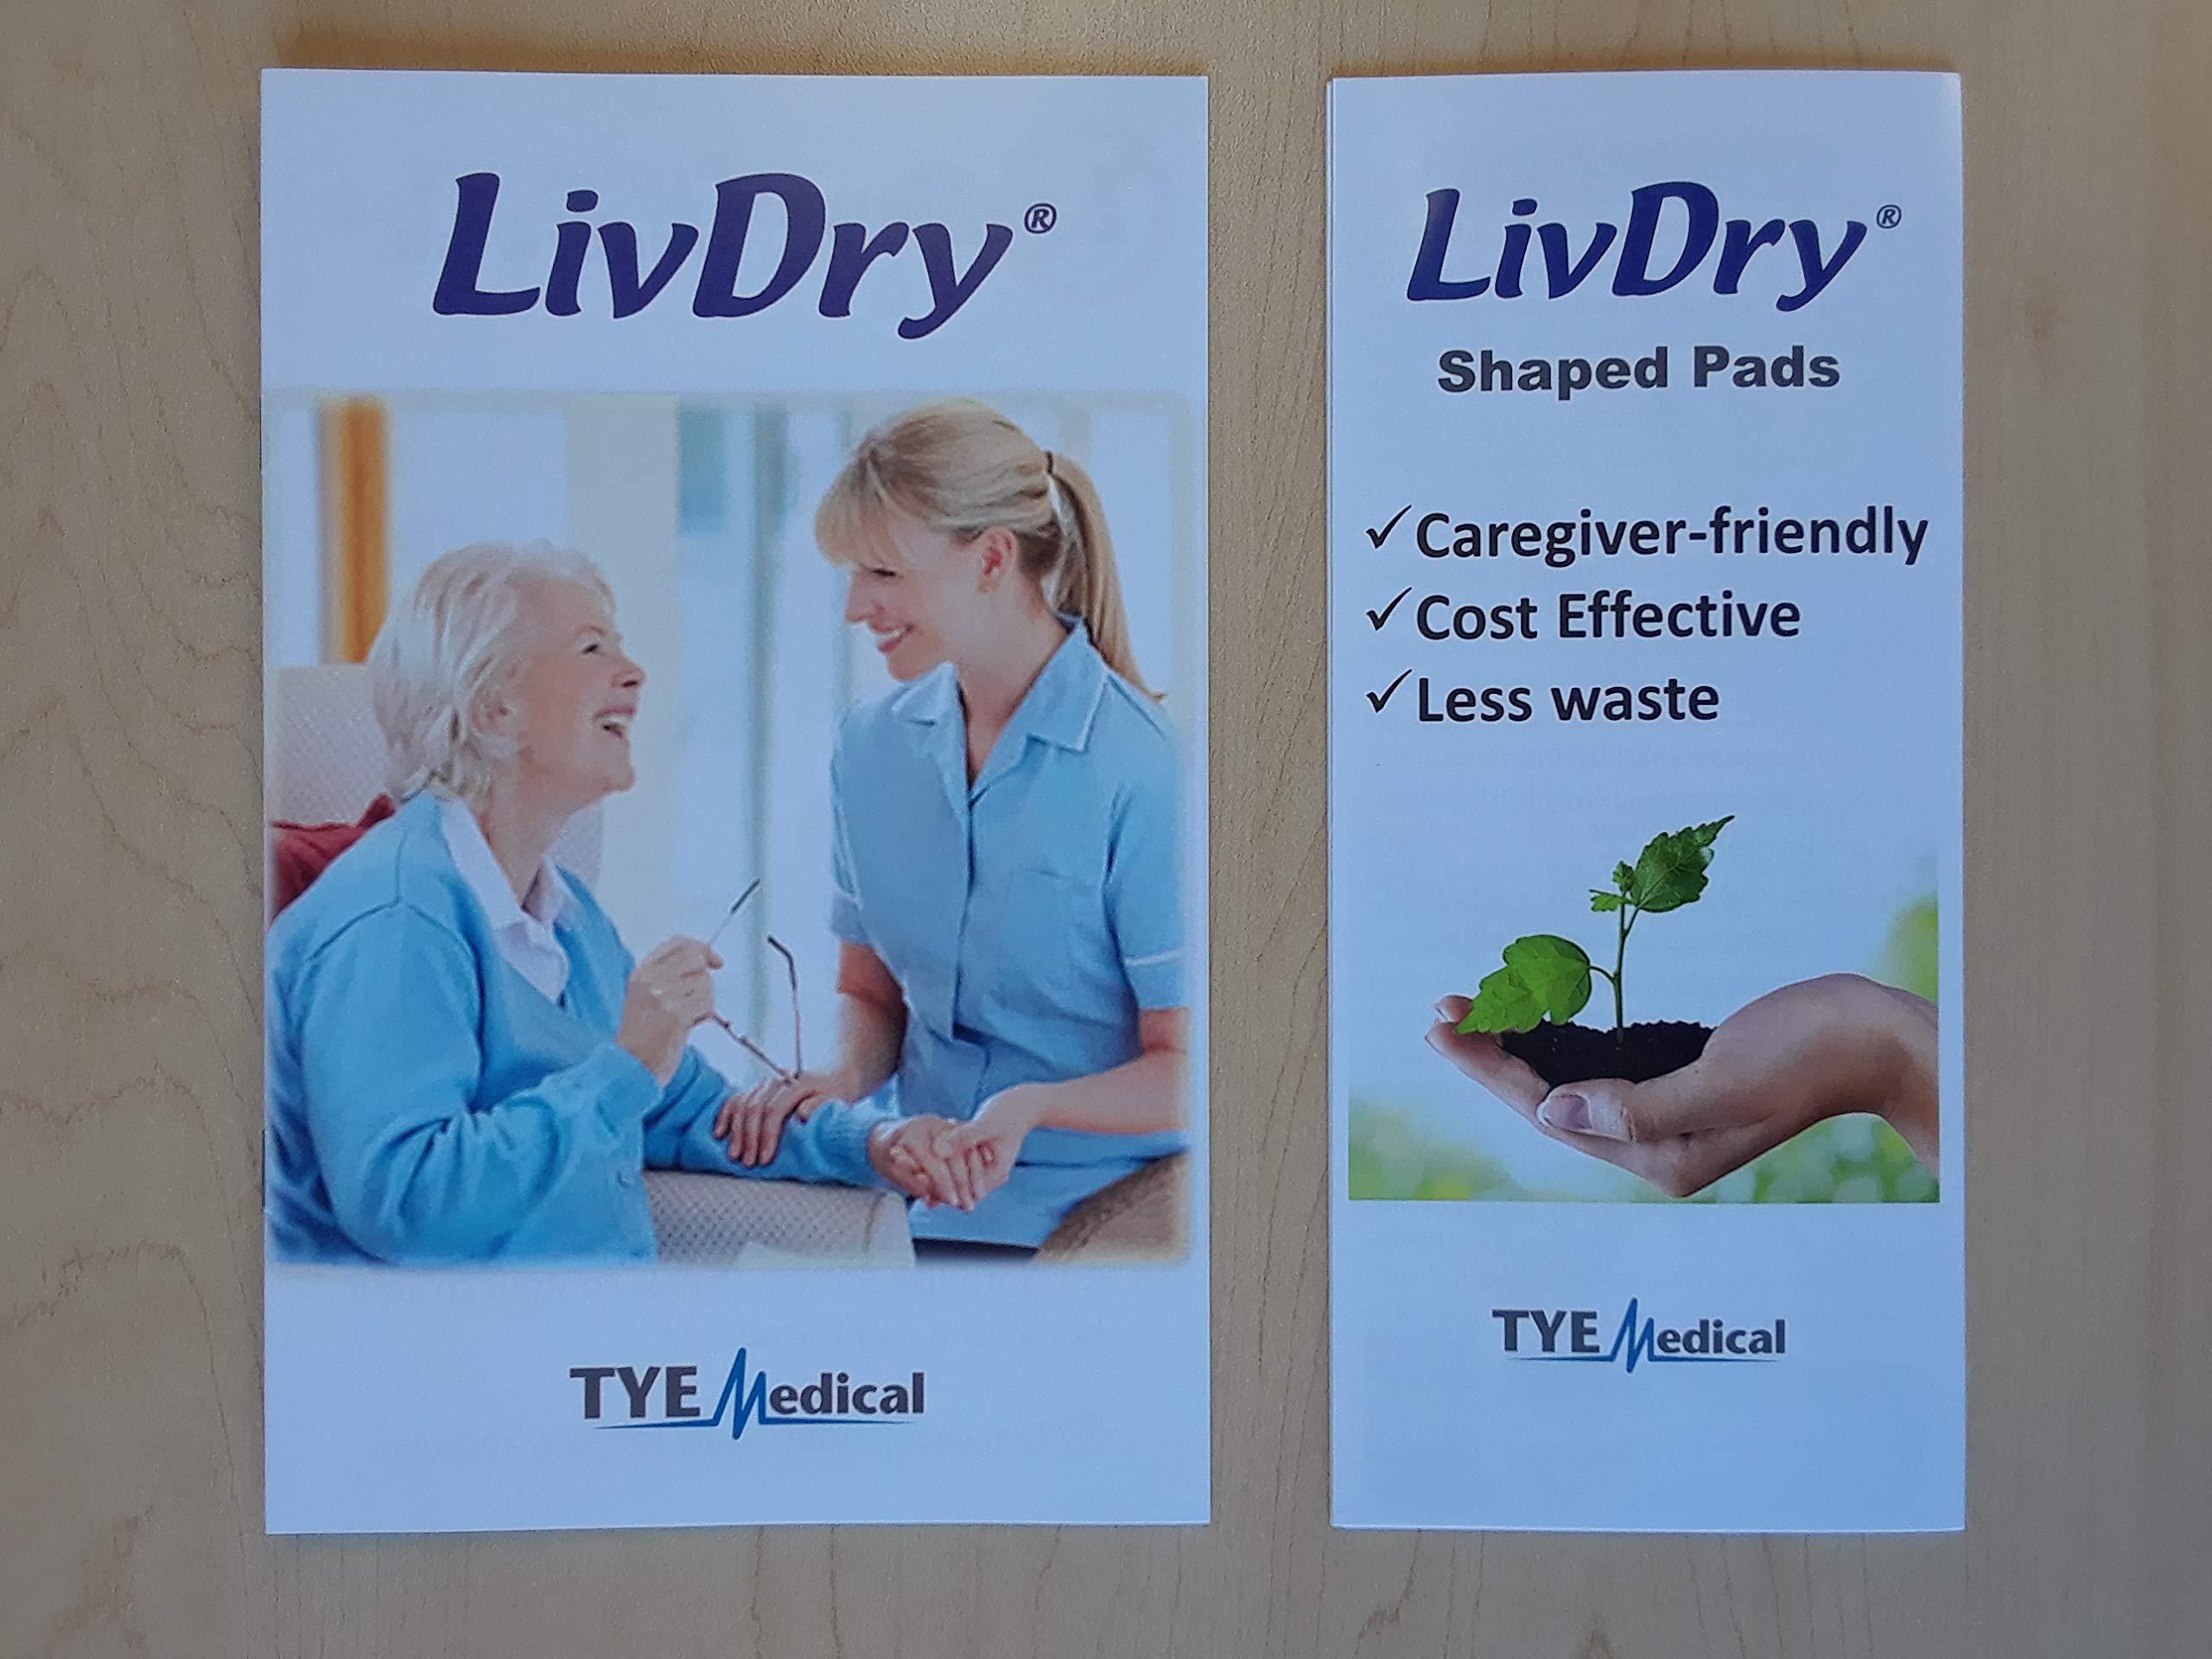 LivDry Premium Brief - Free Sample Pack, M&L (x1 Medium Briefs, x1 Large Briefs, x1 Pad Super, x1 Pad Hyper, x1 Pad Hyper Plus) by LivDry (Image #7)